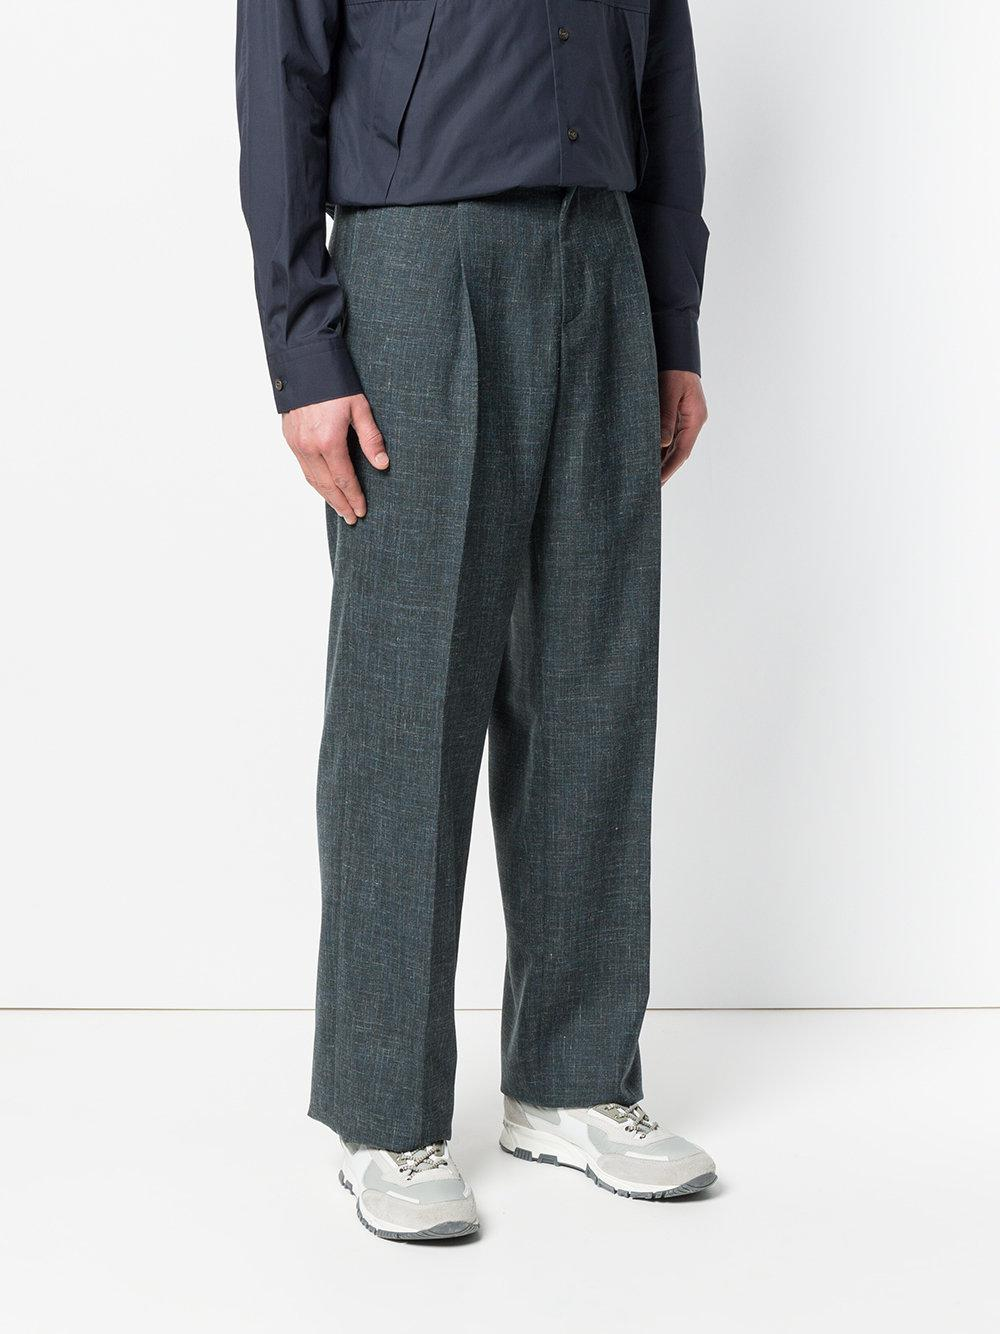 Stella McCartney Linen Tailored Trousers in Grey (Grey) for Men